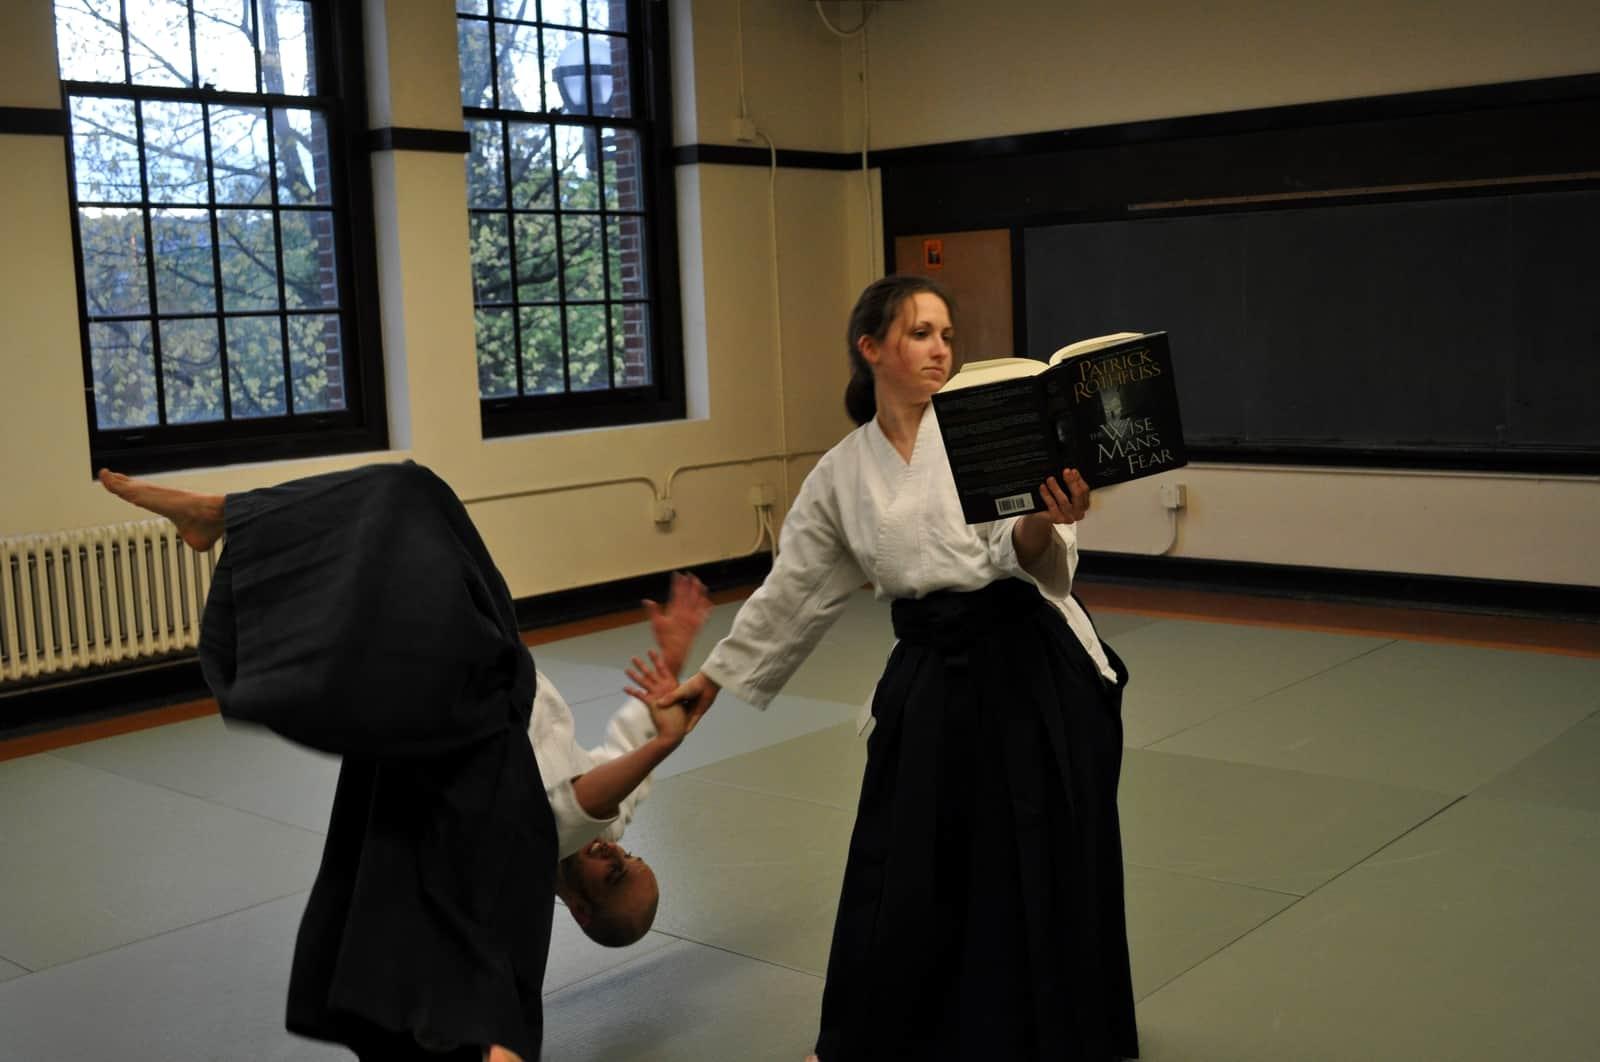 Aikido – martial art